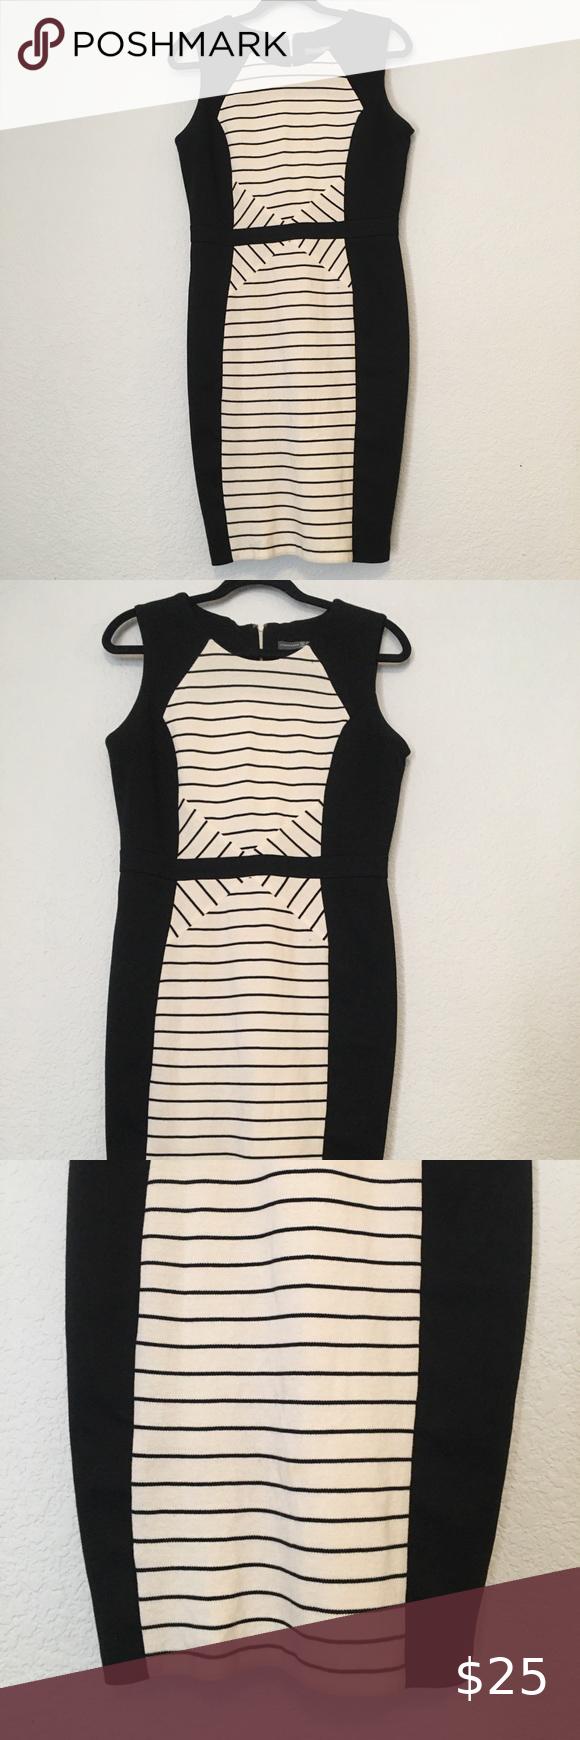 Black White Striped Dress Black White Striped Dress White Striped Dress Striped Pencil Dress [ 1740 x 580 Pixel ]